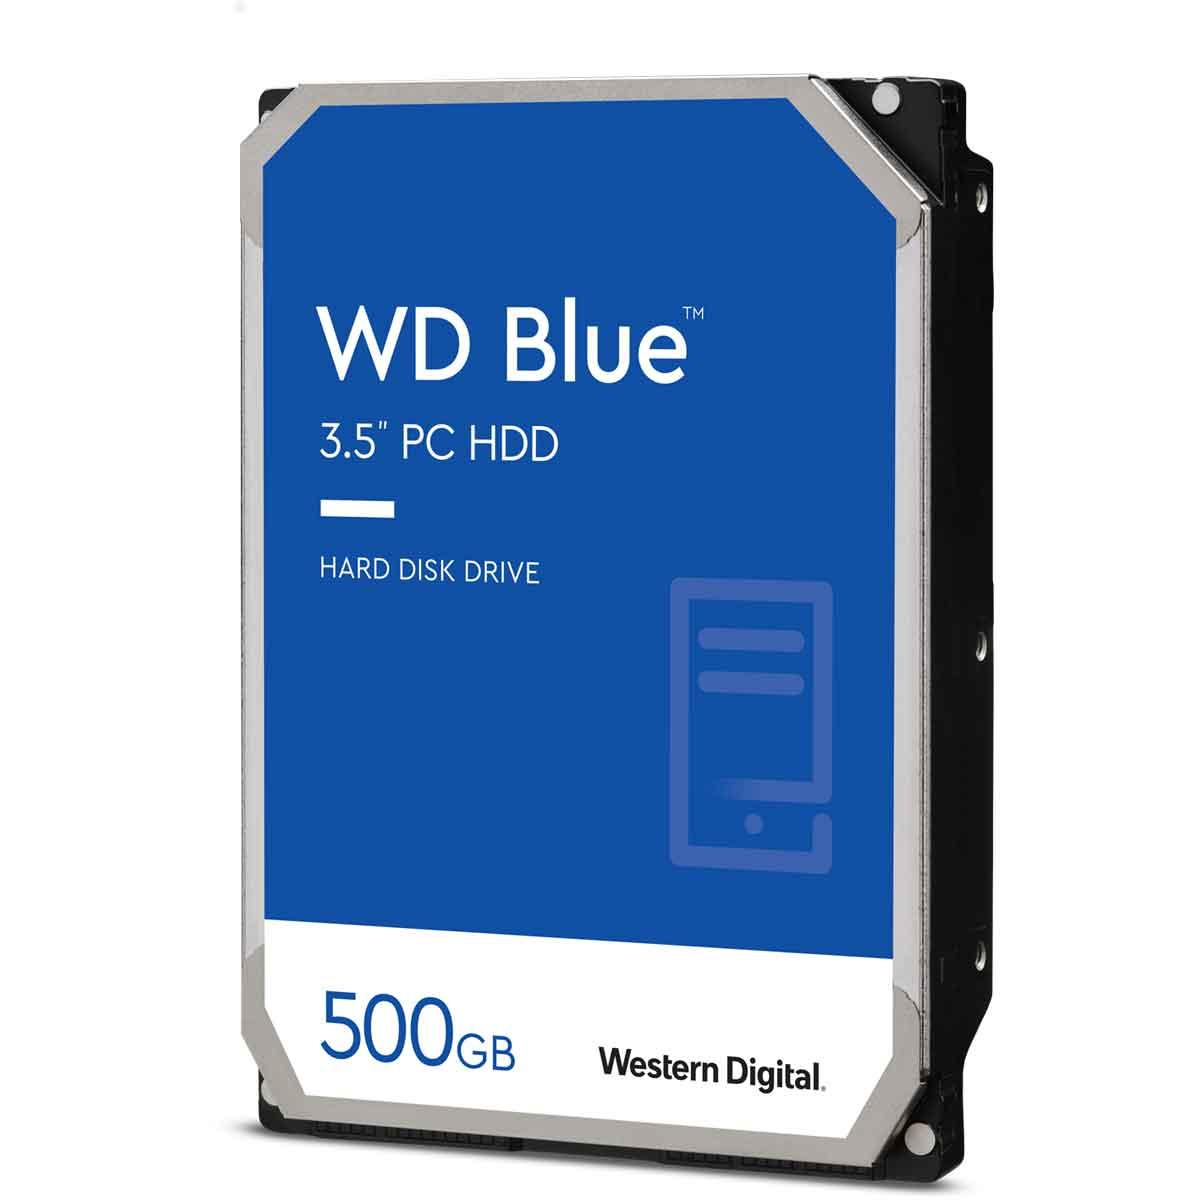 WD5000AZRZ-RT ウエスタンデジタル 【バルク品】3.5インチ 内蔵ハードディスク 500GB WesternDigital WD Blue [WD5000AZRZRT]【返品種別B】【送料無料】